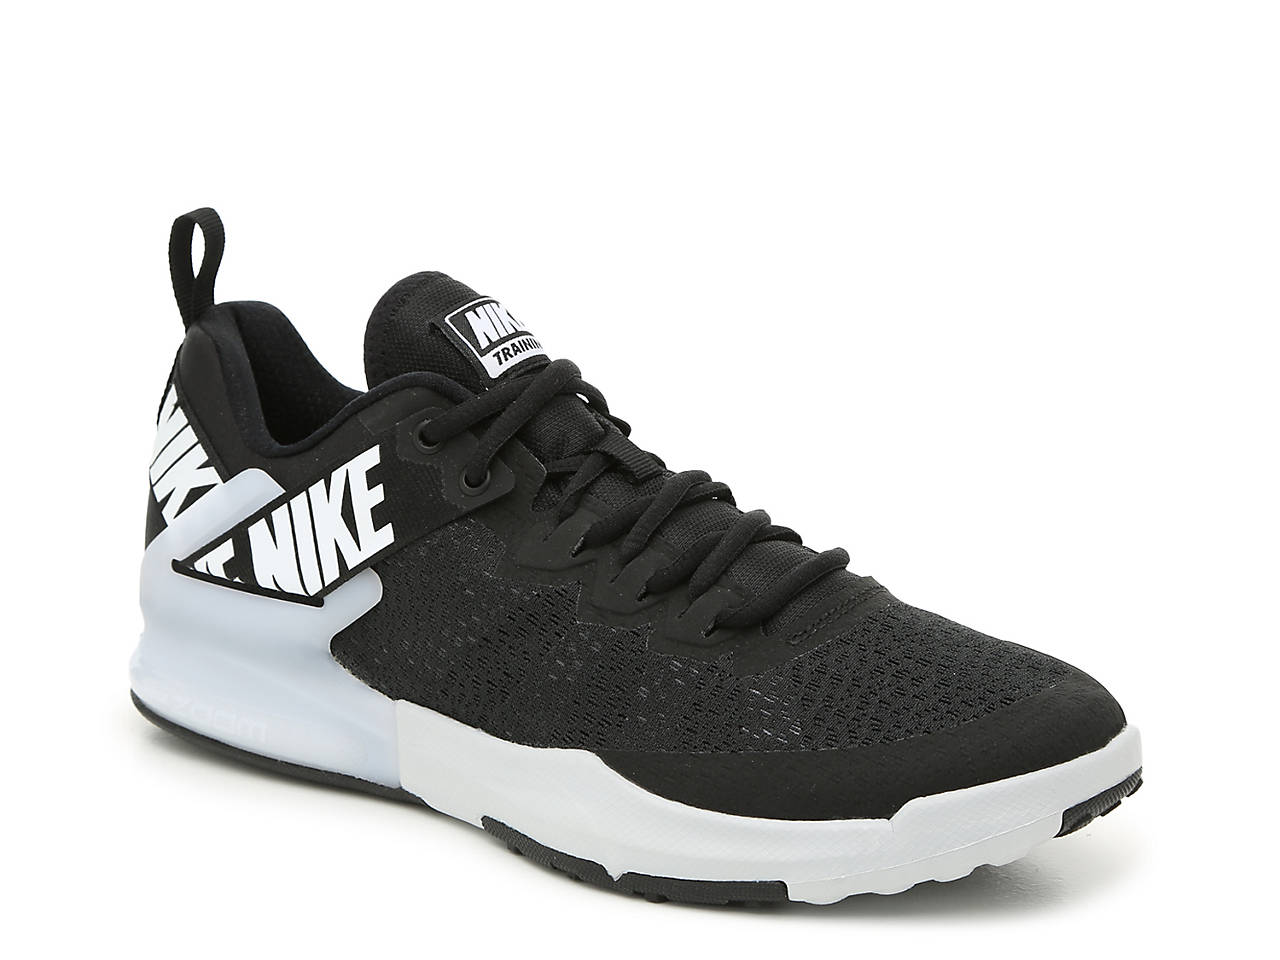 ead8bd2fe574 Nike Zoom Domination TR 2 Training Shoe - Men s Men s Shoes